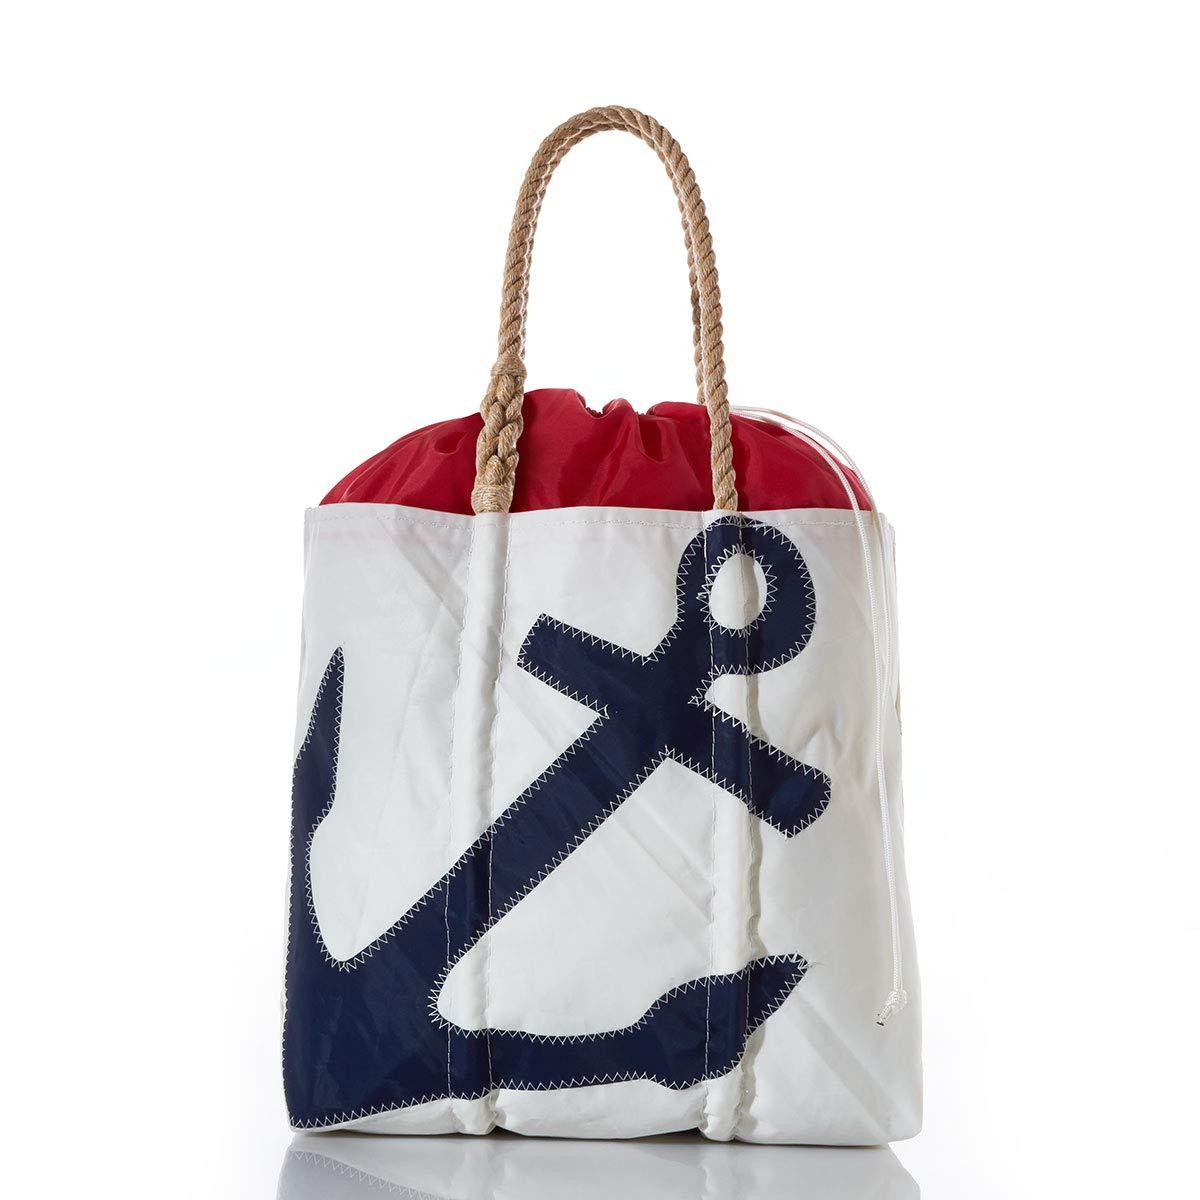 Sea Bags レディース US サイズ: M B074DR46LD